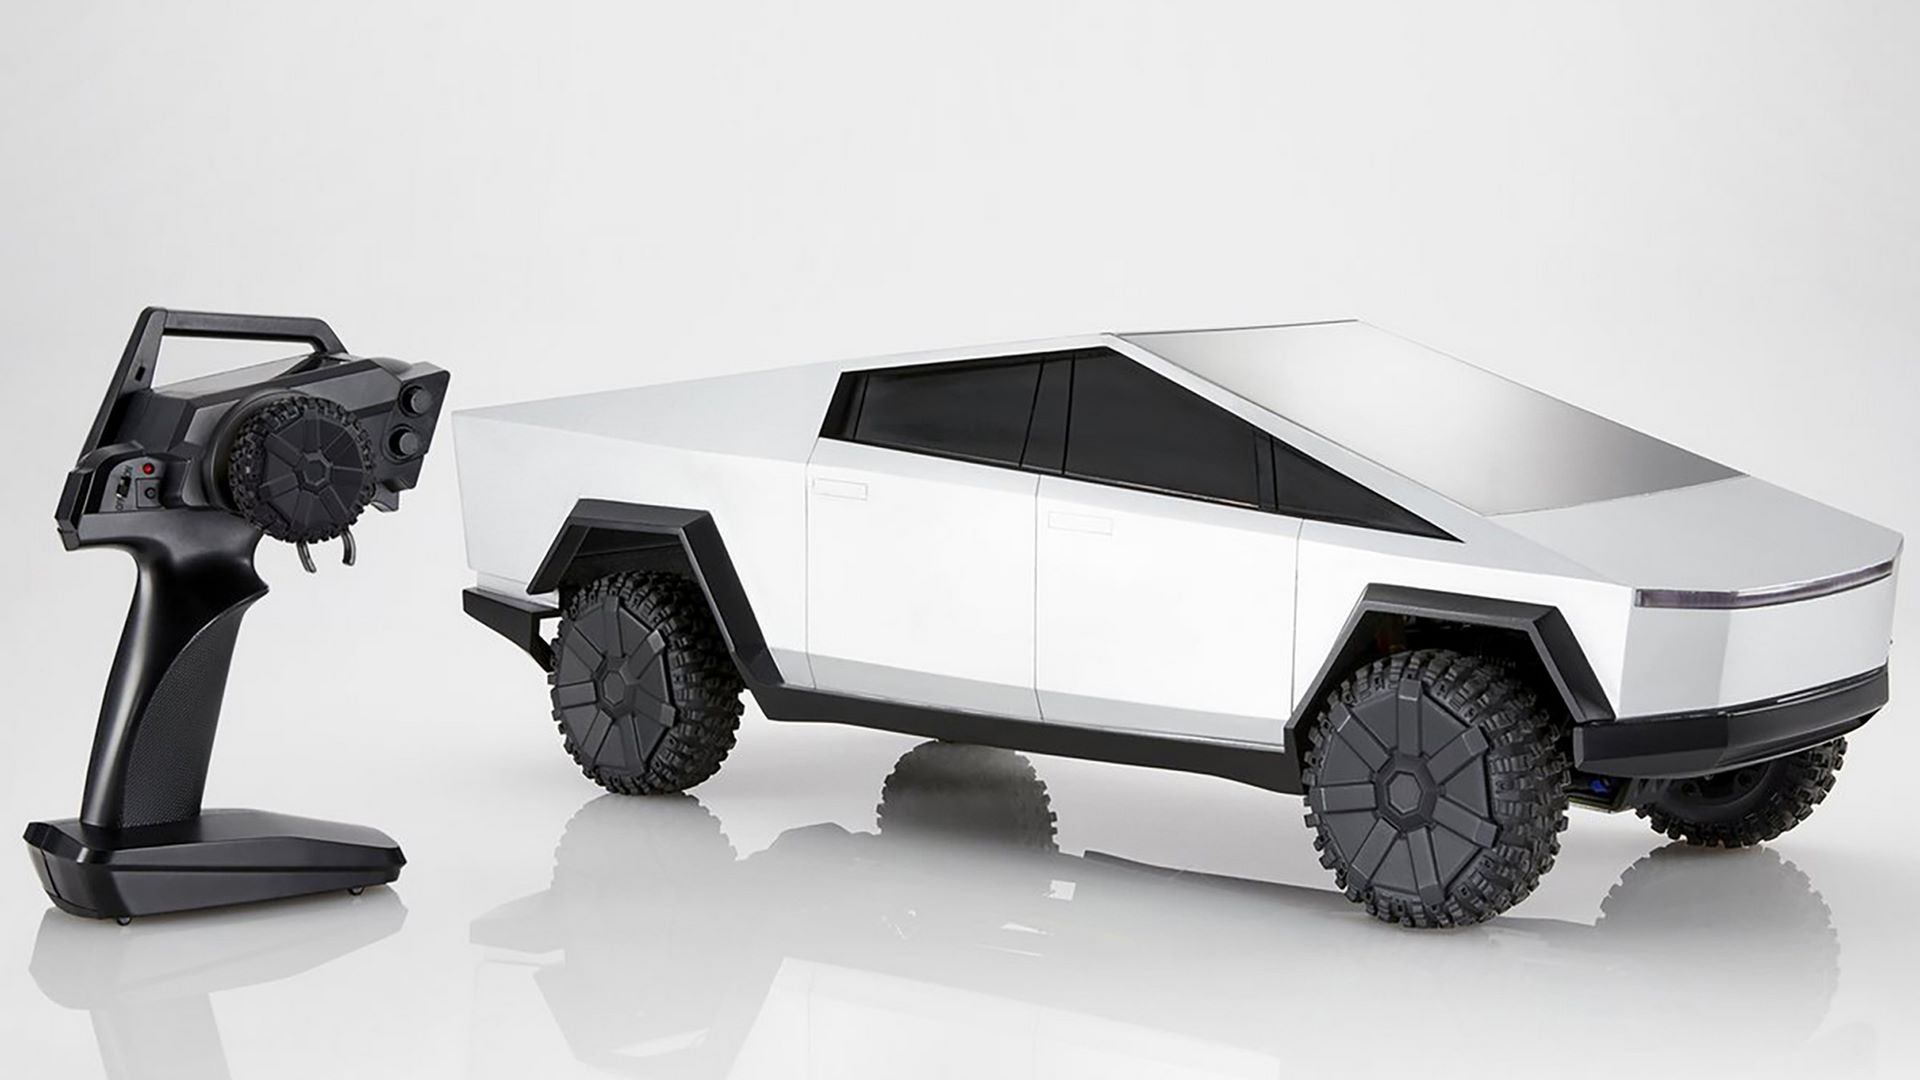 Hot-Wheels-RC-Tesla-Cybertruck-16